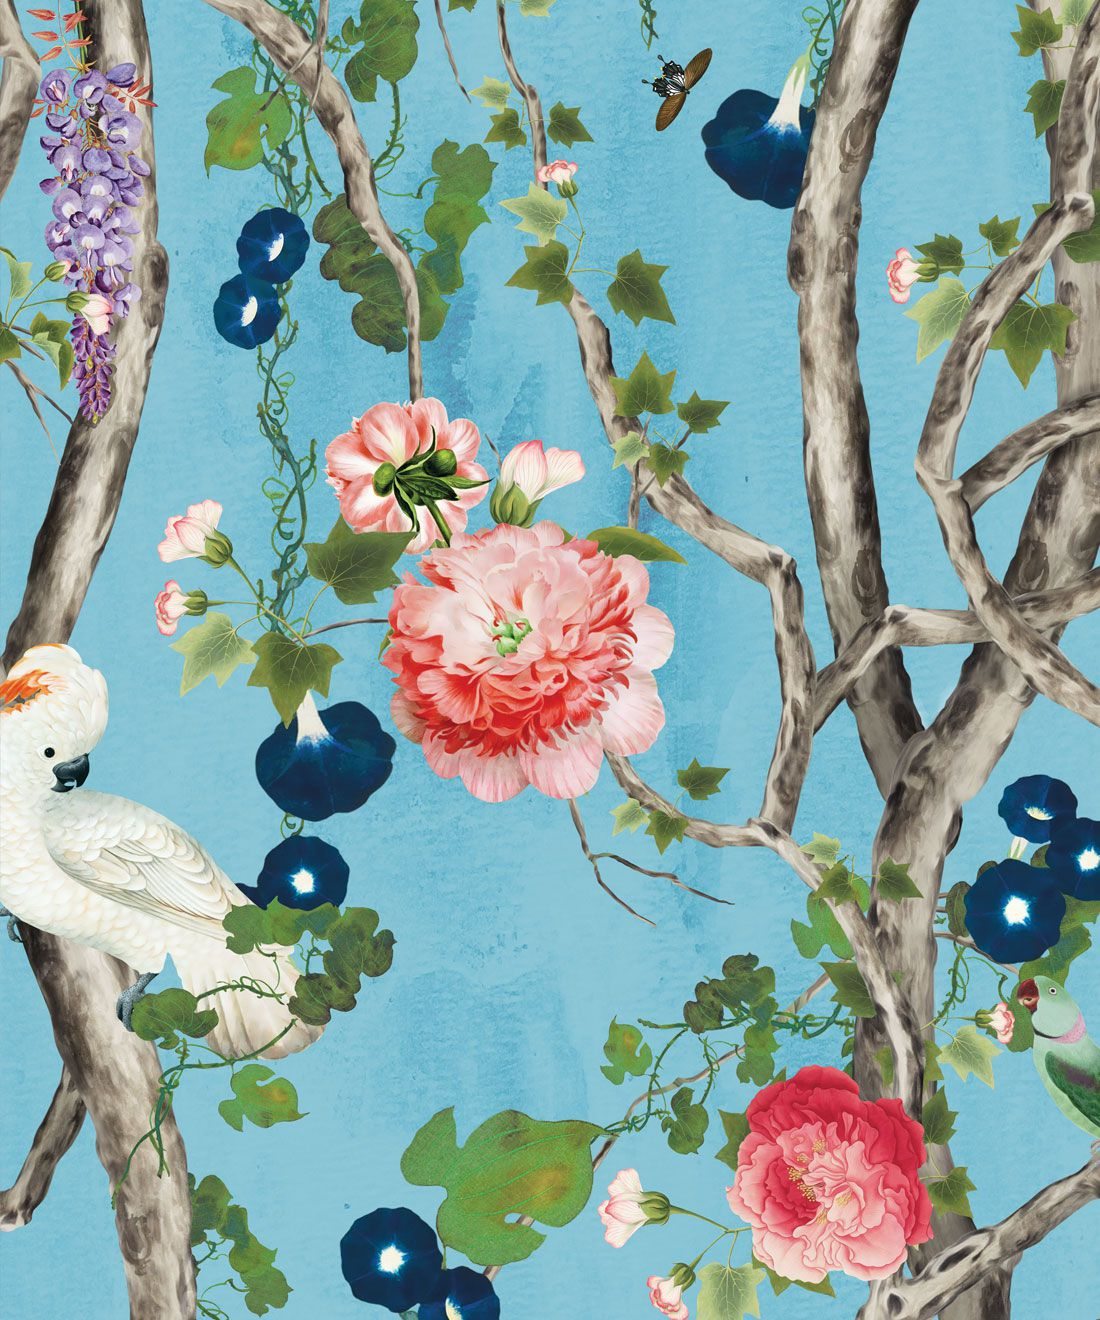 Empress Wallpaper • Romantic Wallpaper • Floral Wallpaper • Chinoiserie Wallpaper • Sky Blue colour wallpaper swatch